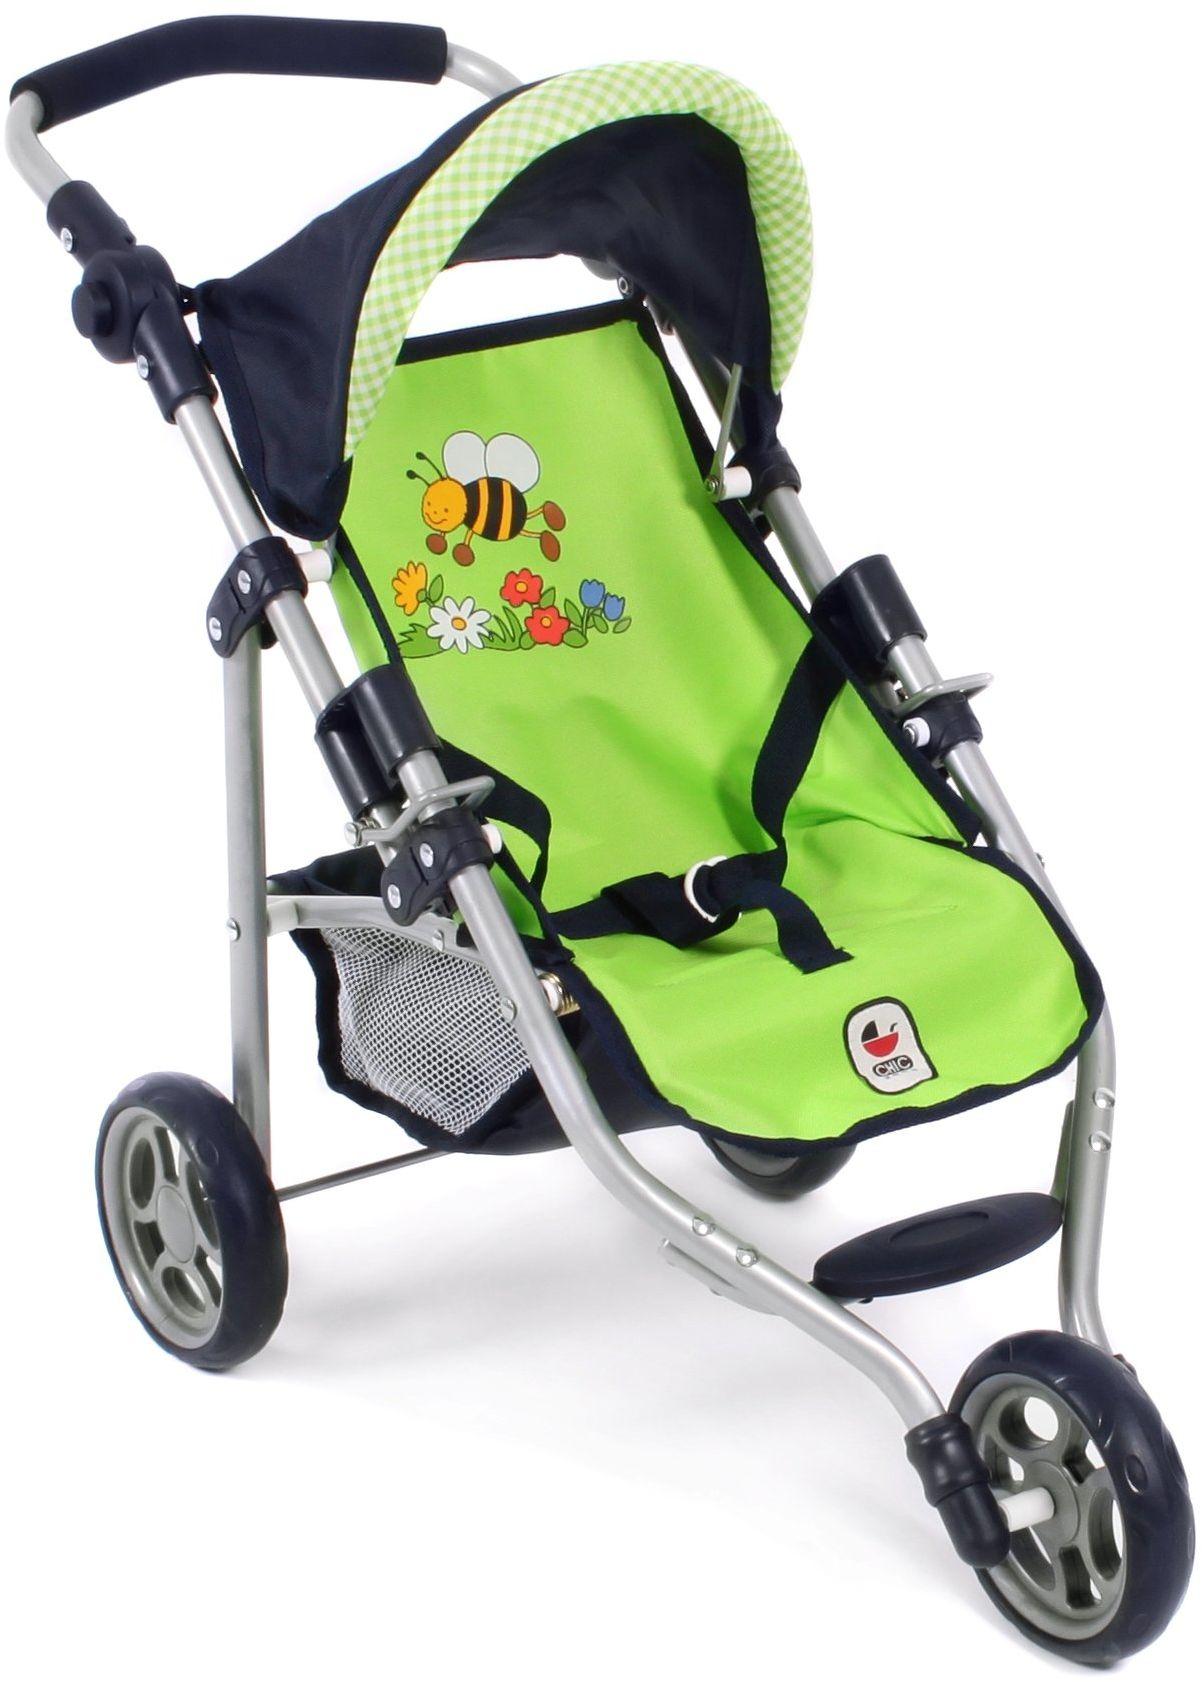 Bayer Chic 2000 612 16 - Jogging Buggy Lola, wózek dla lalek, Bumblebee, zielony